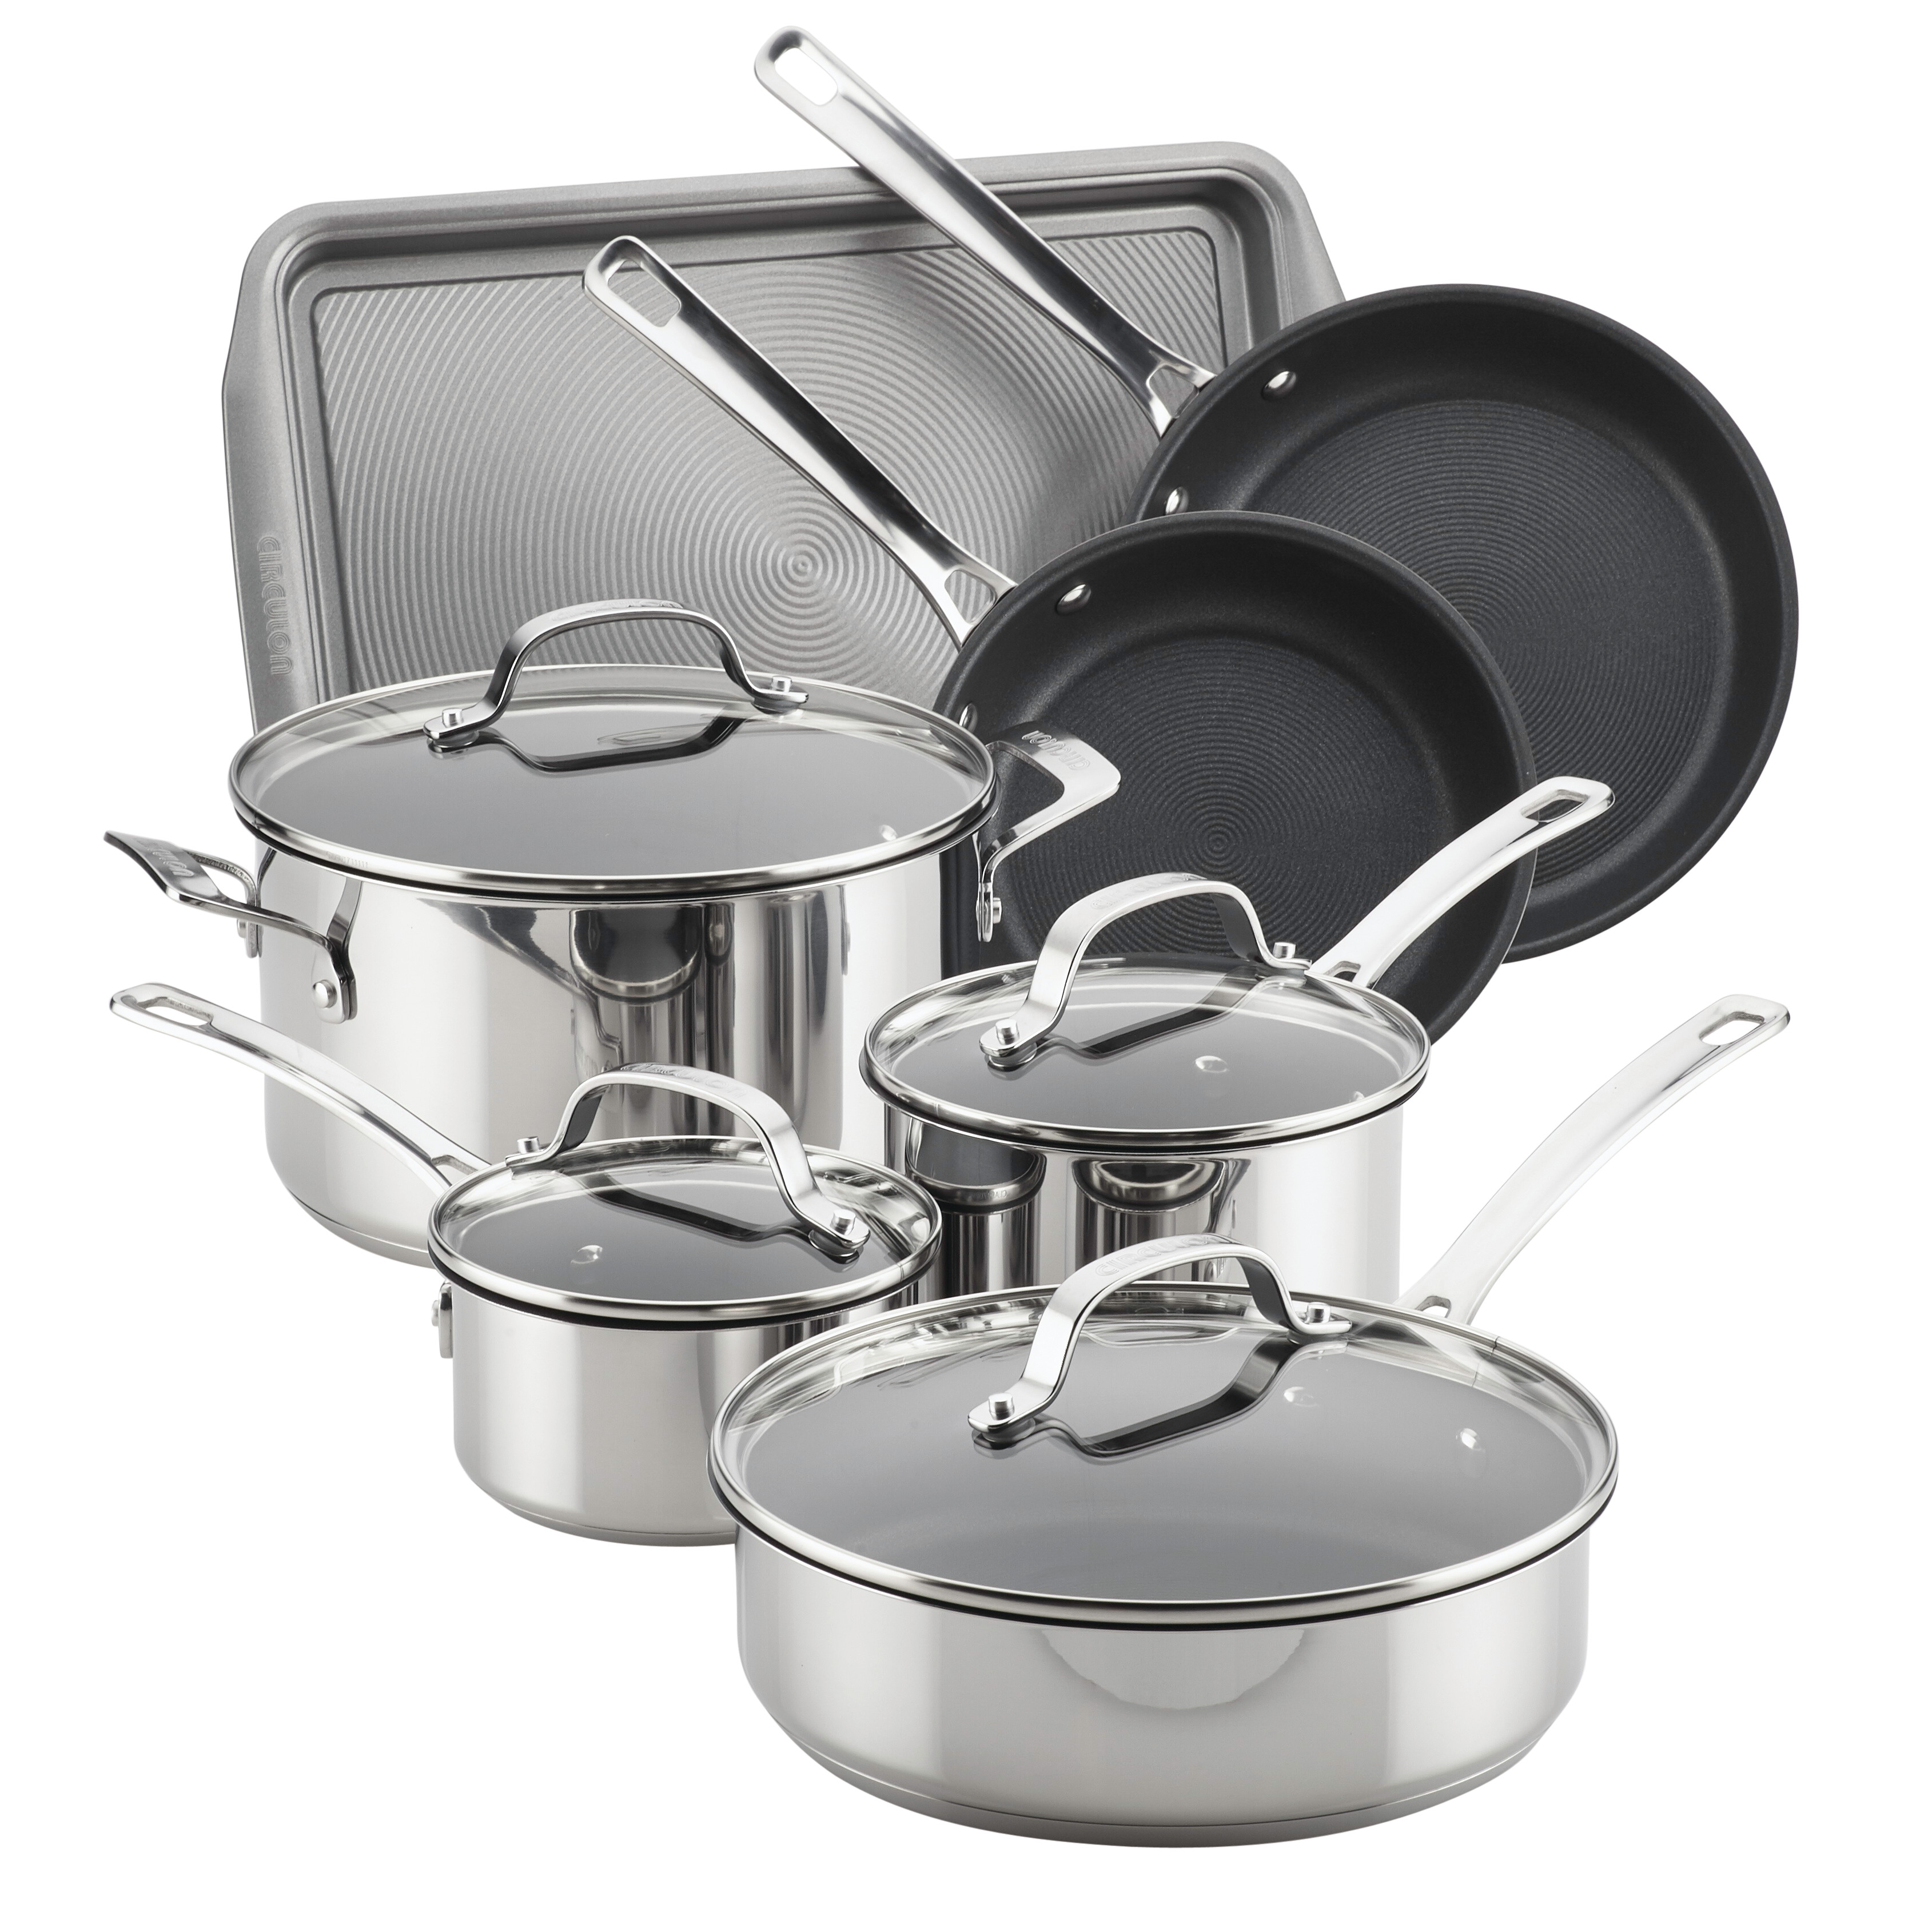 Circulon Genesis Stainless Steel Nonstick 11-Piece Cookware Set